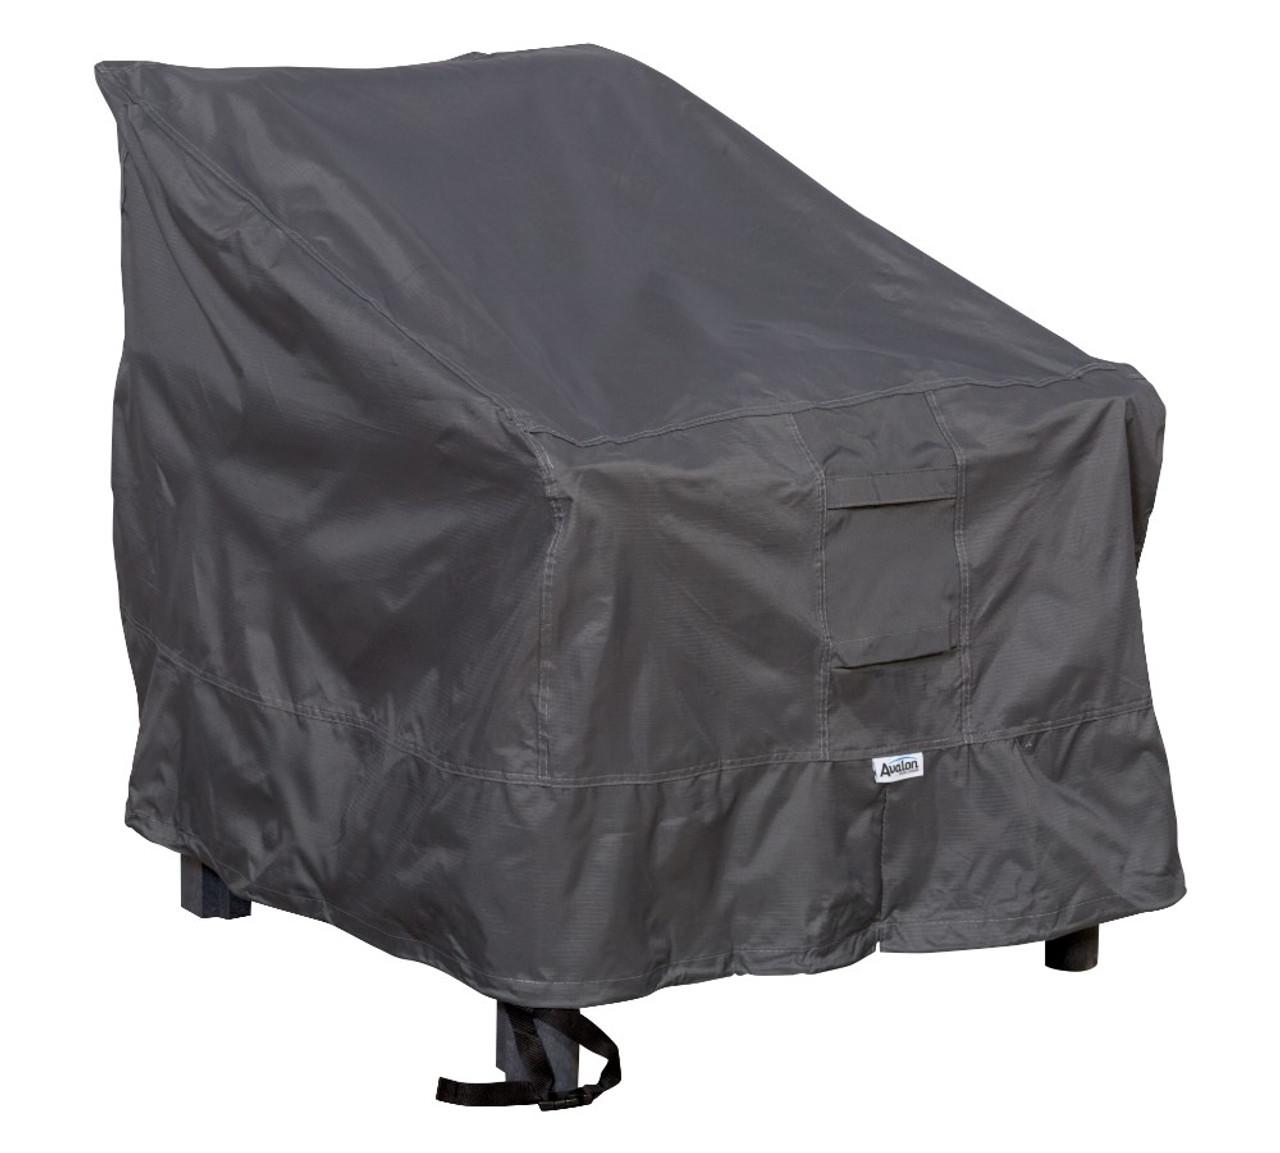 Avalon high back chair cover